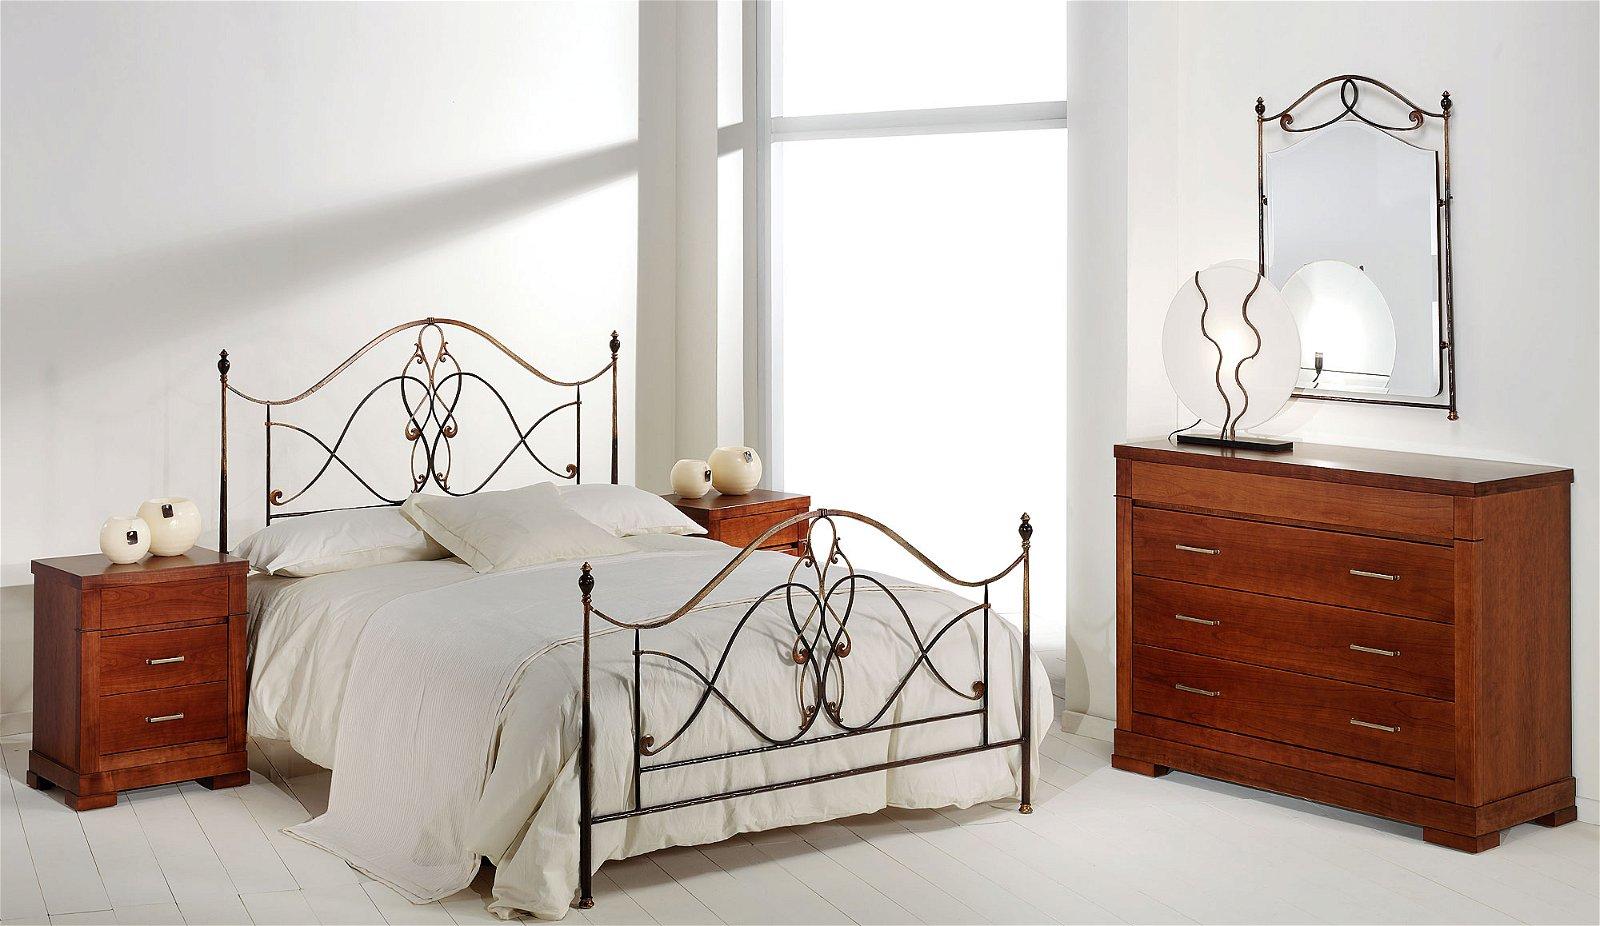 Dormitorio forja Floria